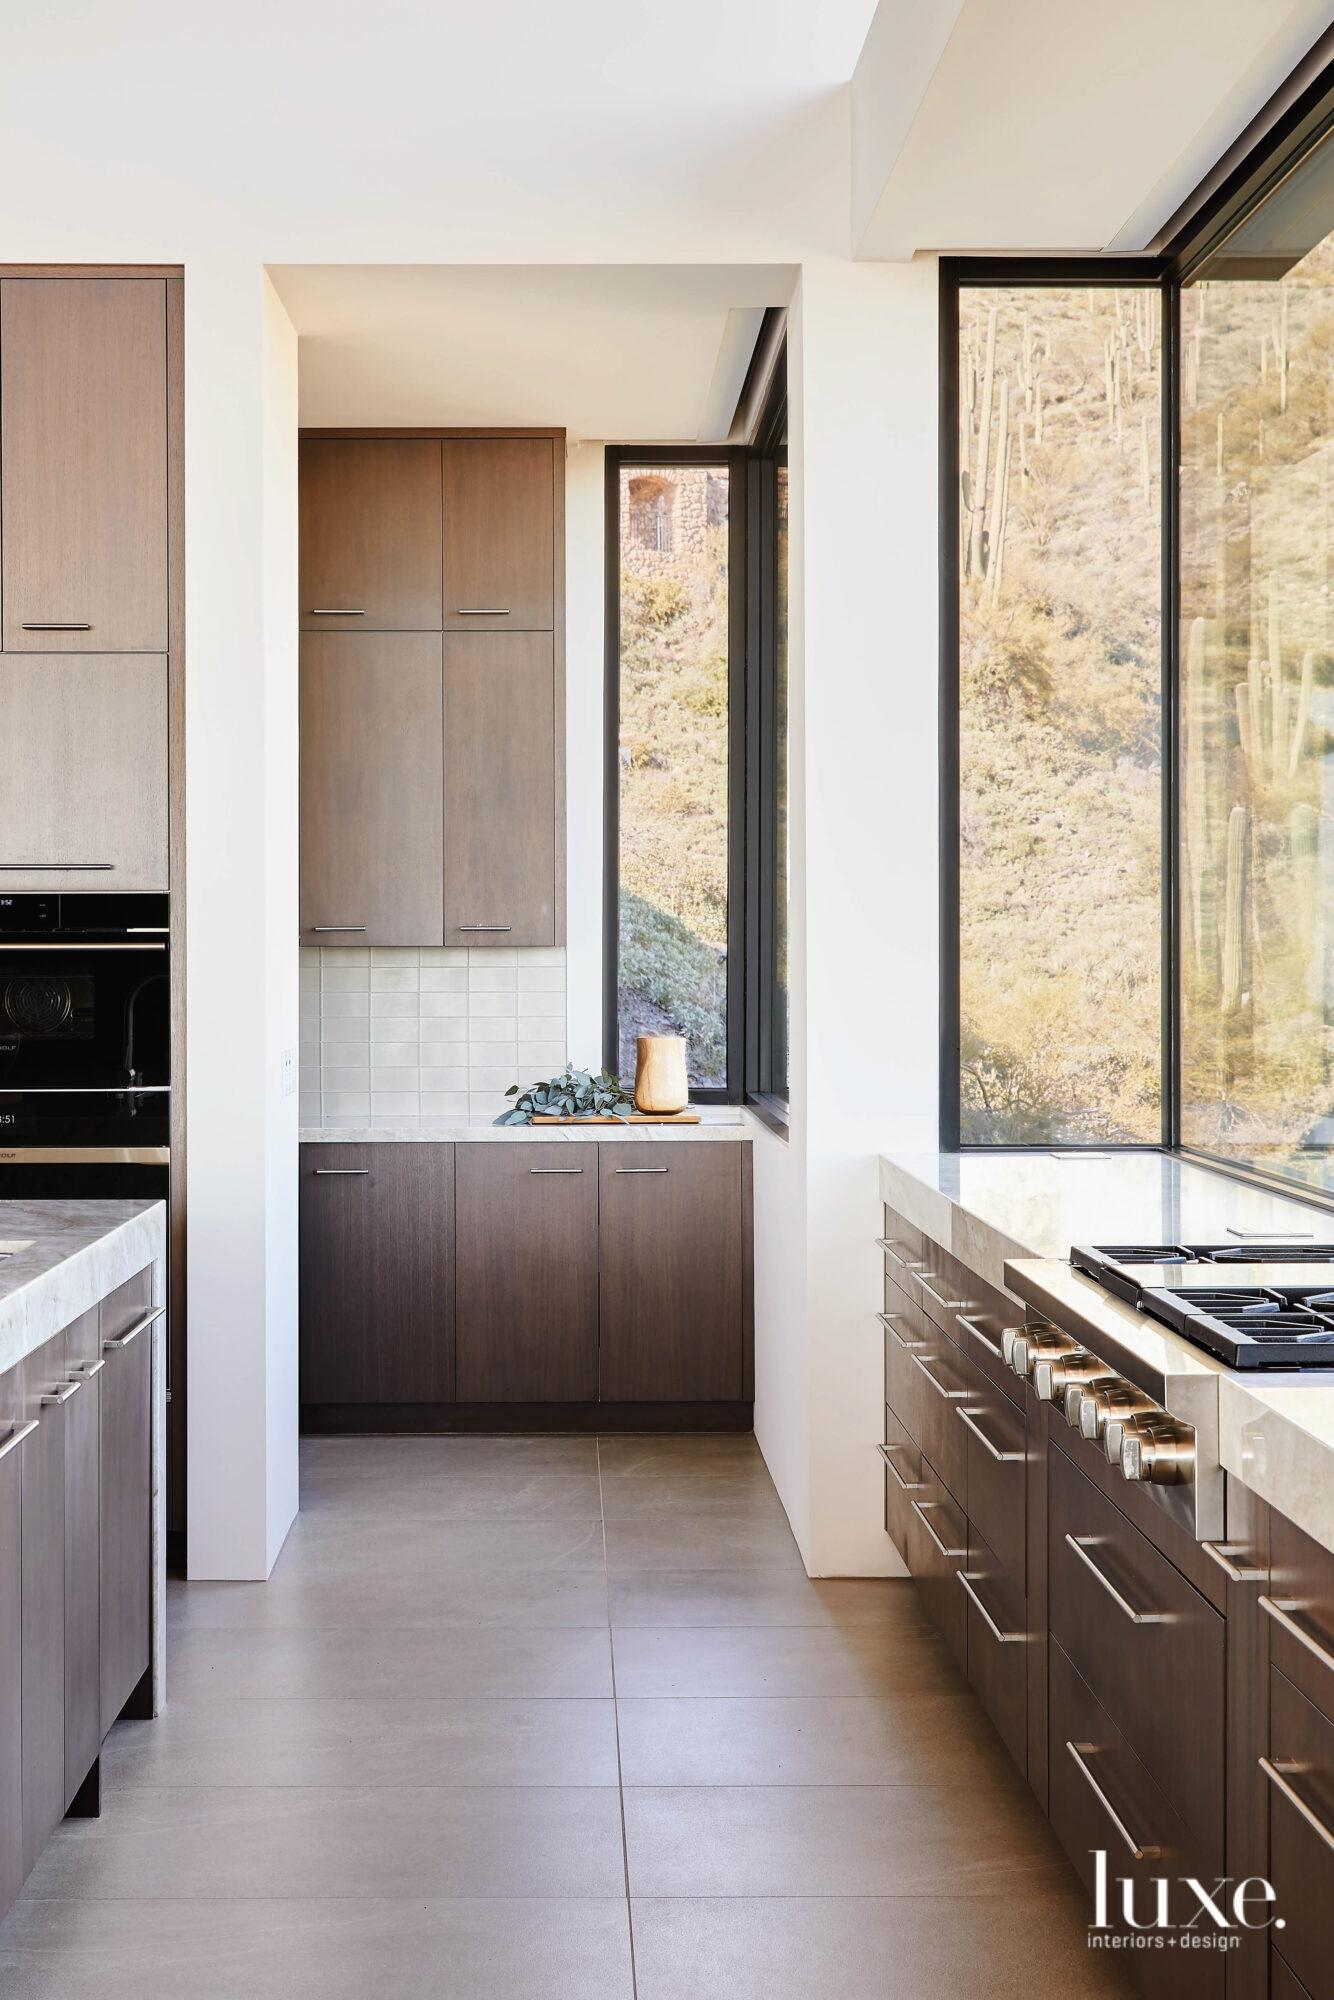 The sleek, modern kitchen has...